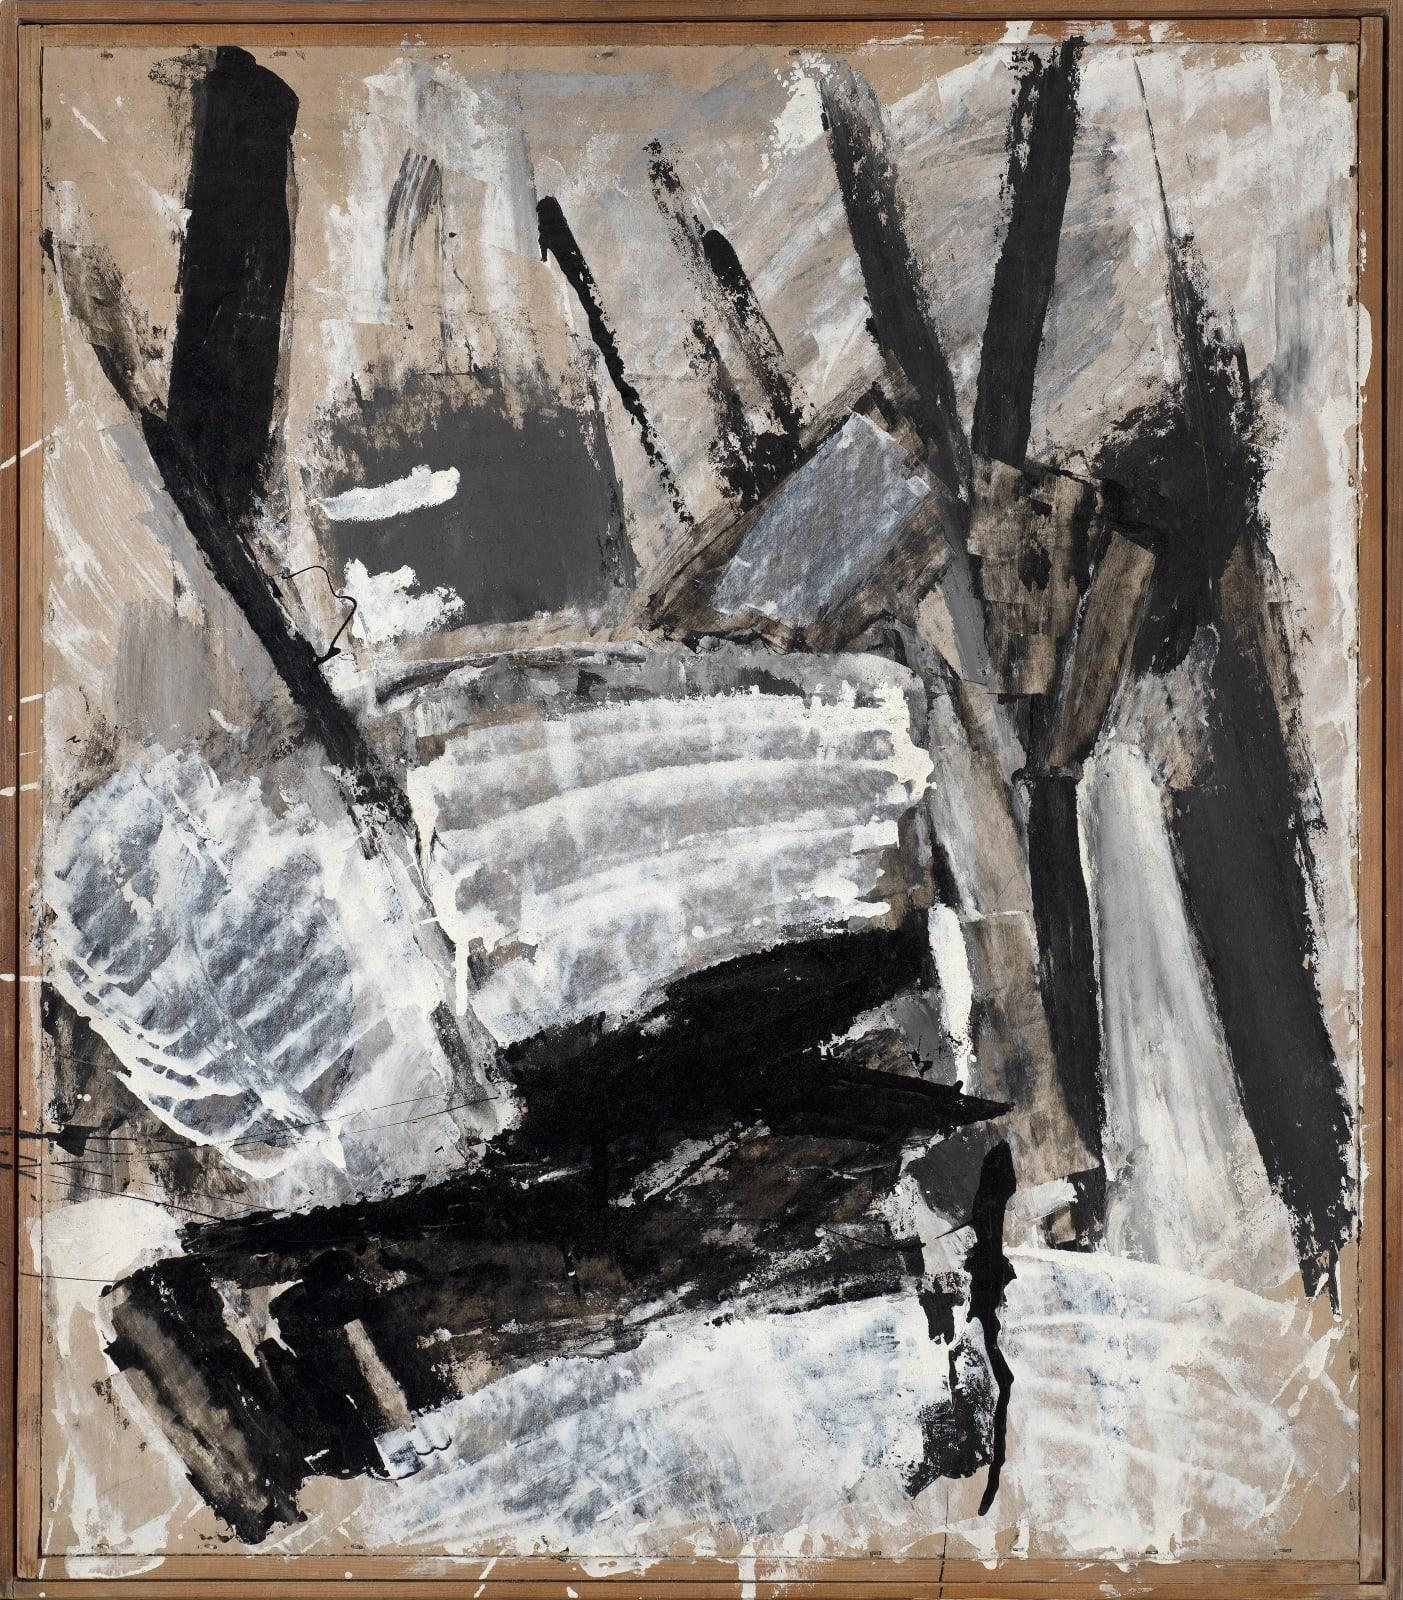 Gustav Metzger Painting on Cardboard Oil on found kodak box, c. 1961-62 68.4 x 59.4cm. The Gustav Metzger Foundation